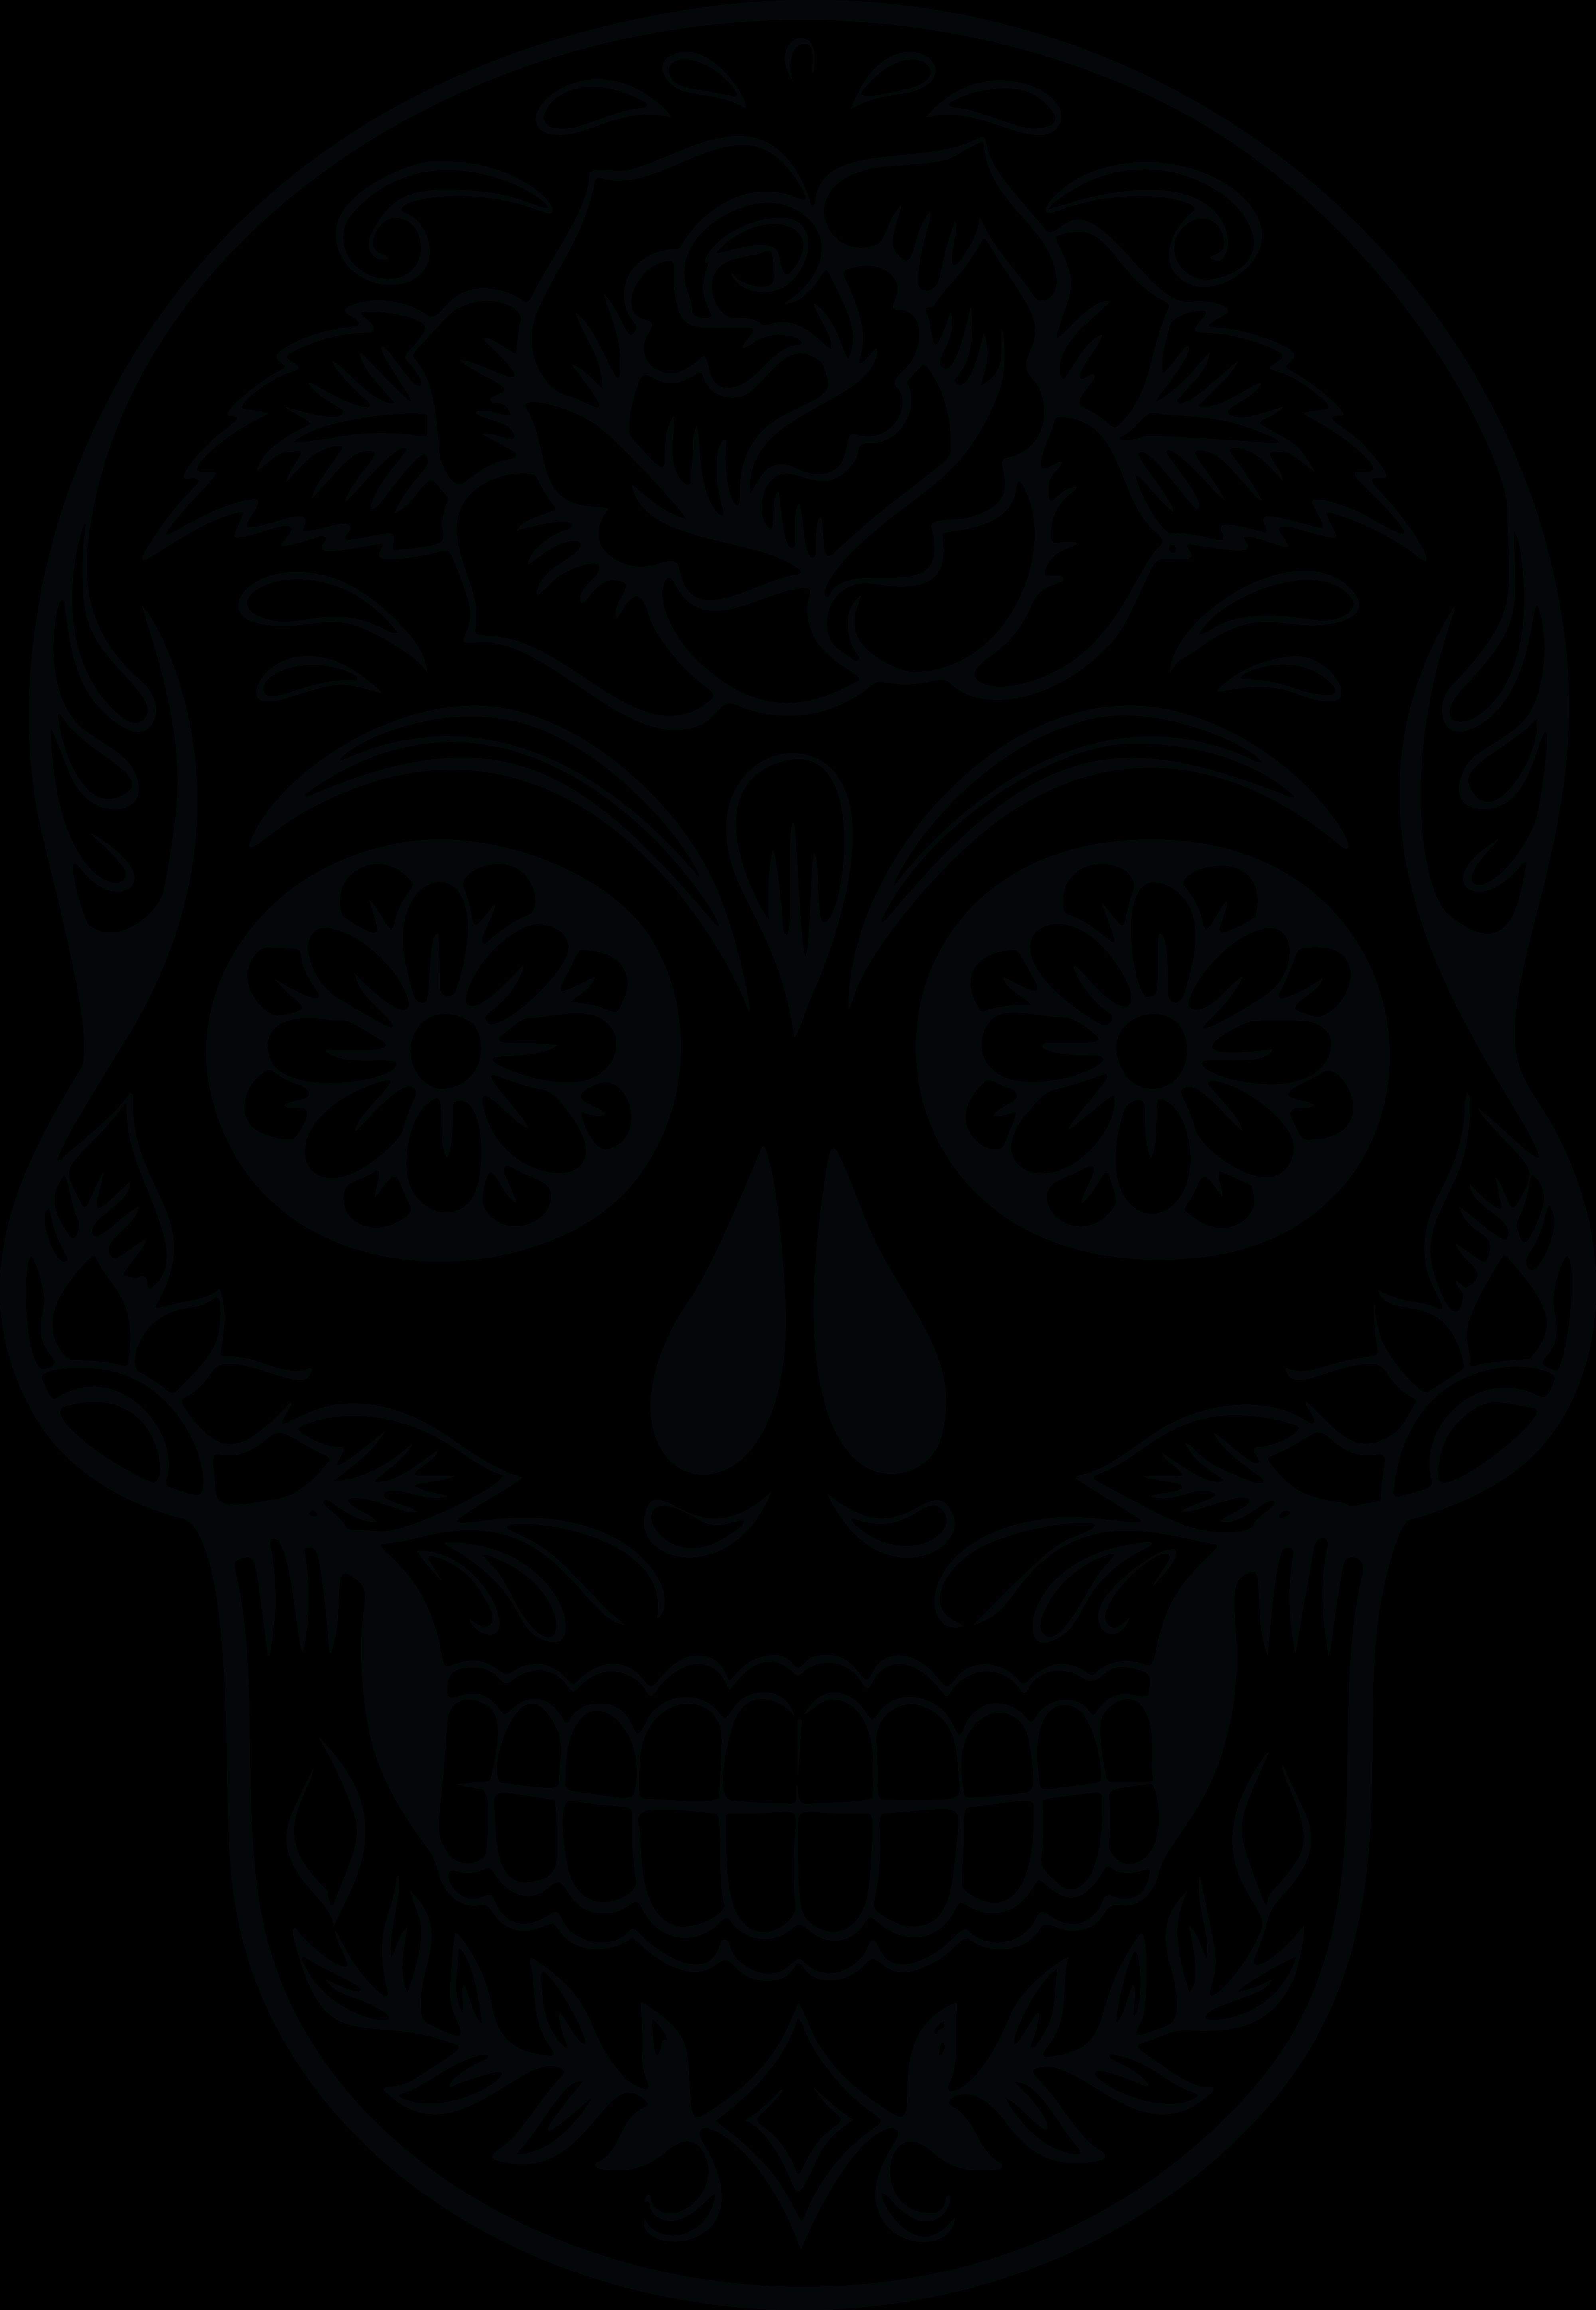 Sugar skull pumpkin clipart clip transparent download 28+ Collection of Sugar Skull Clipart Free | High quality, free ... clip transparent download